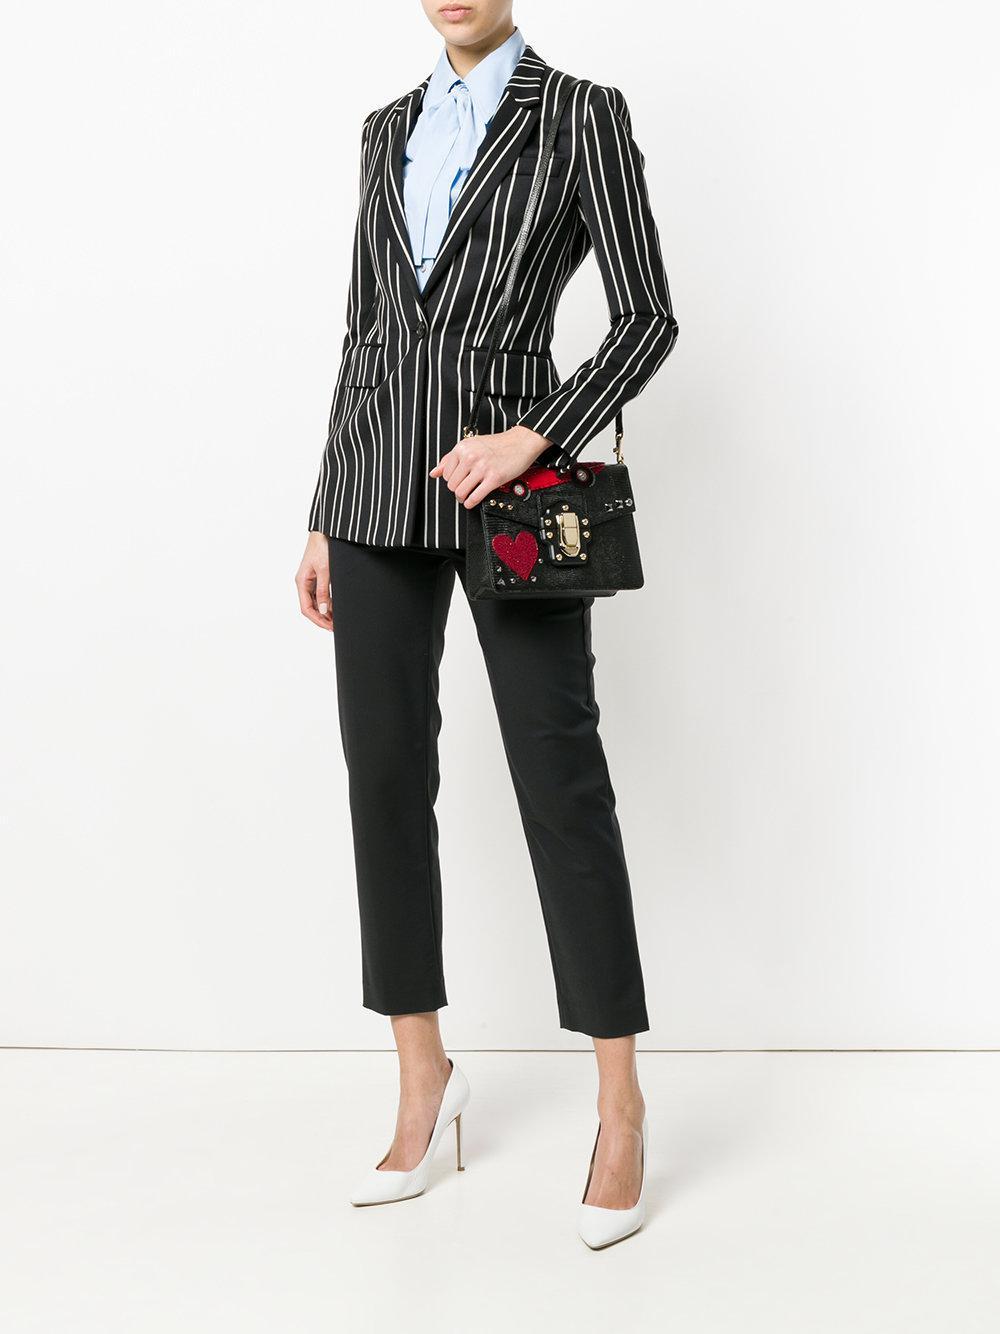 Lyst Dolce con cuentas Lucia negro Bag Parche Gabbana 8OOqp0